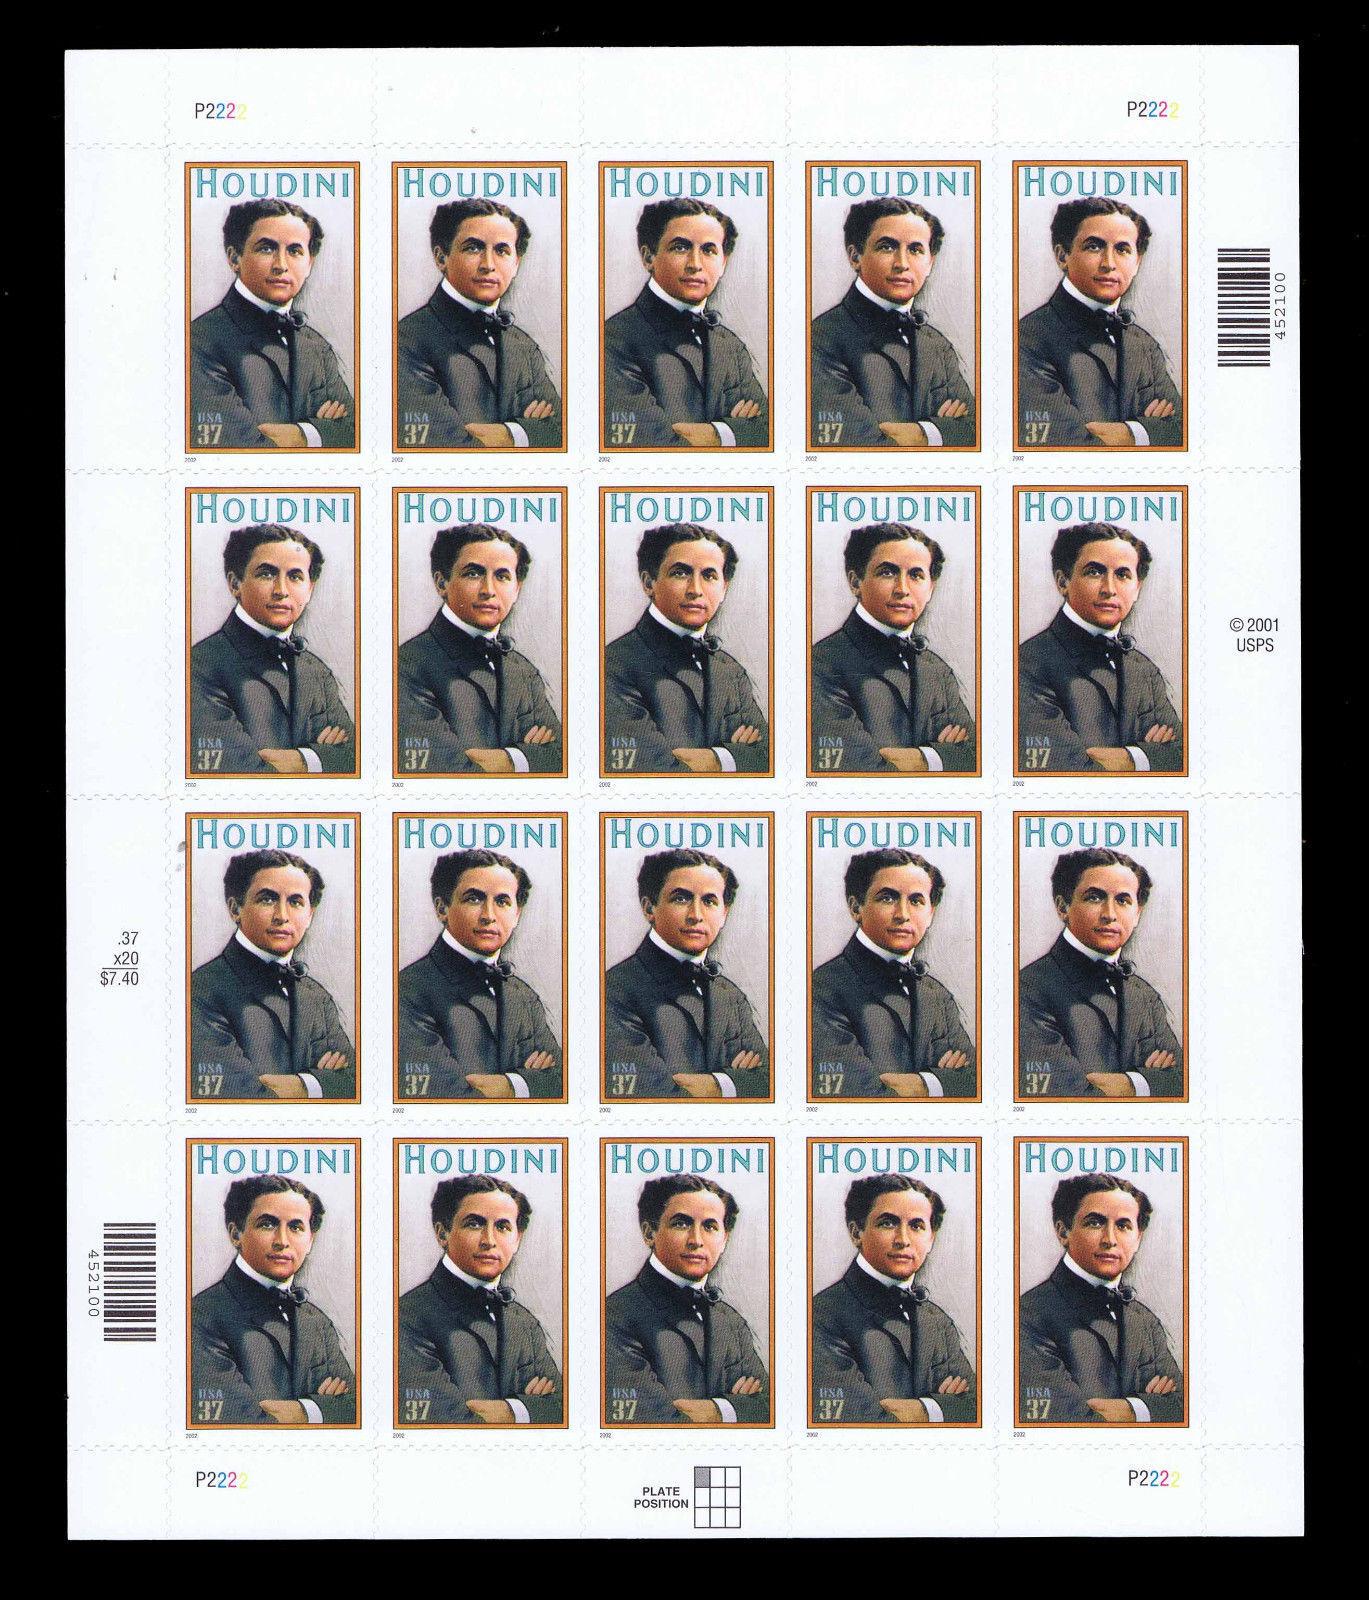 2002 37c Harry Houdini, Magician, Sheet of 20 Scott 365